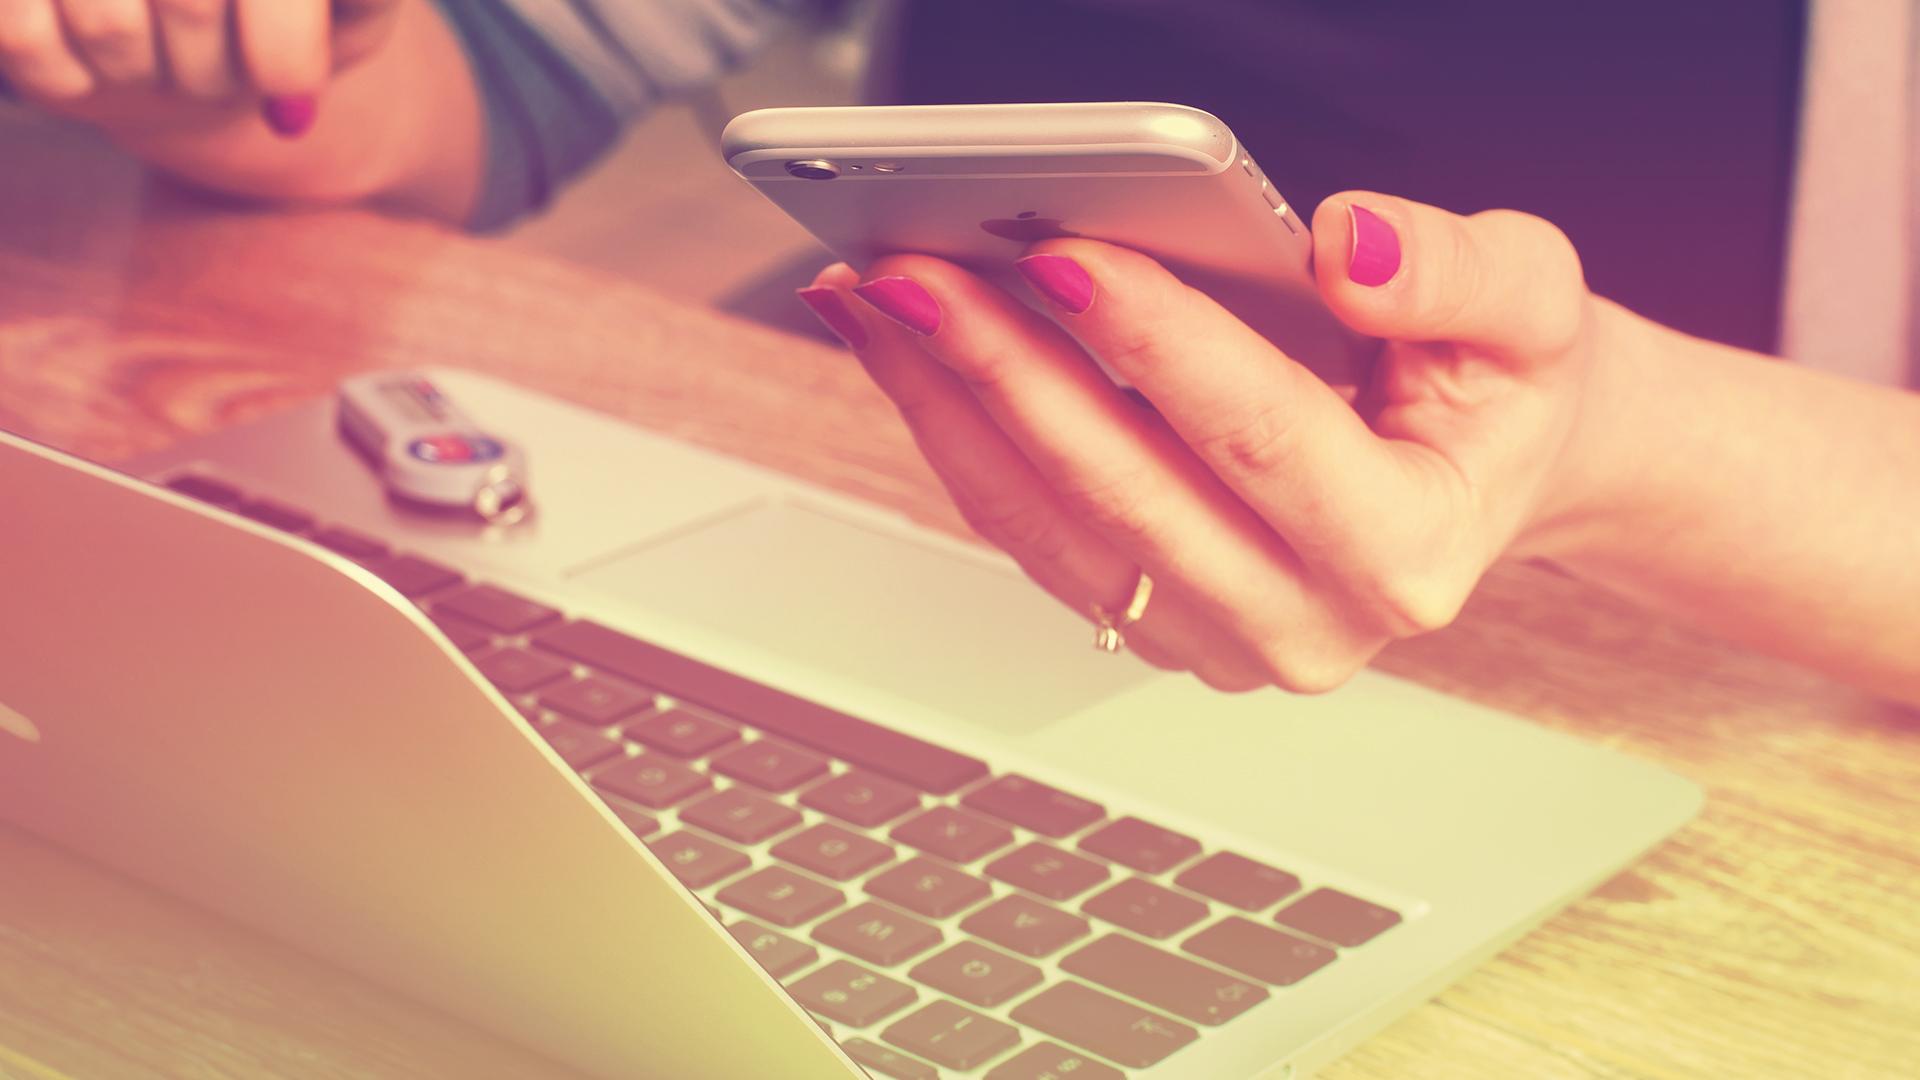 The hyper-mobile Millennial